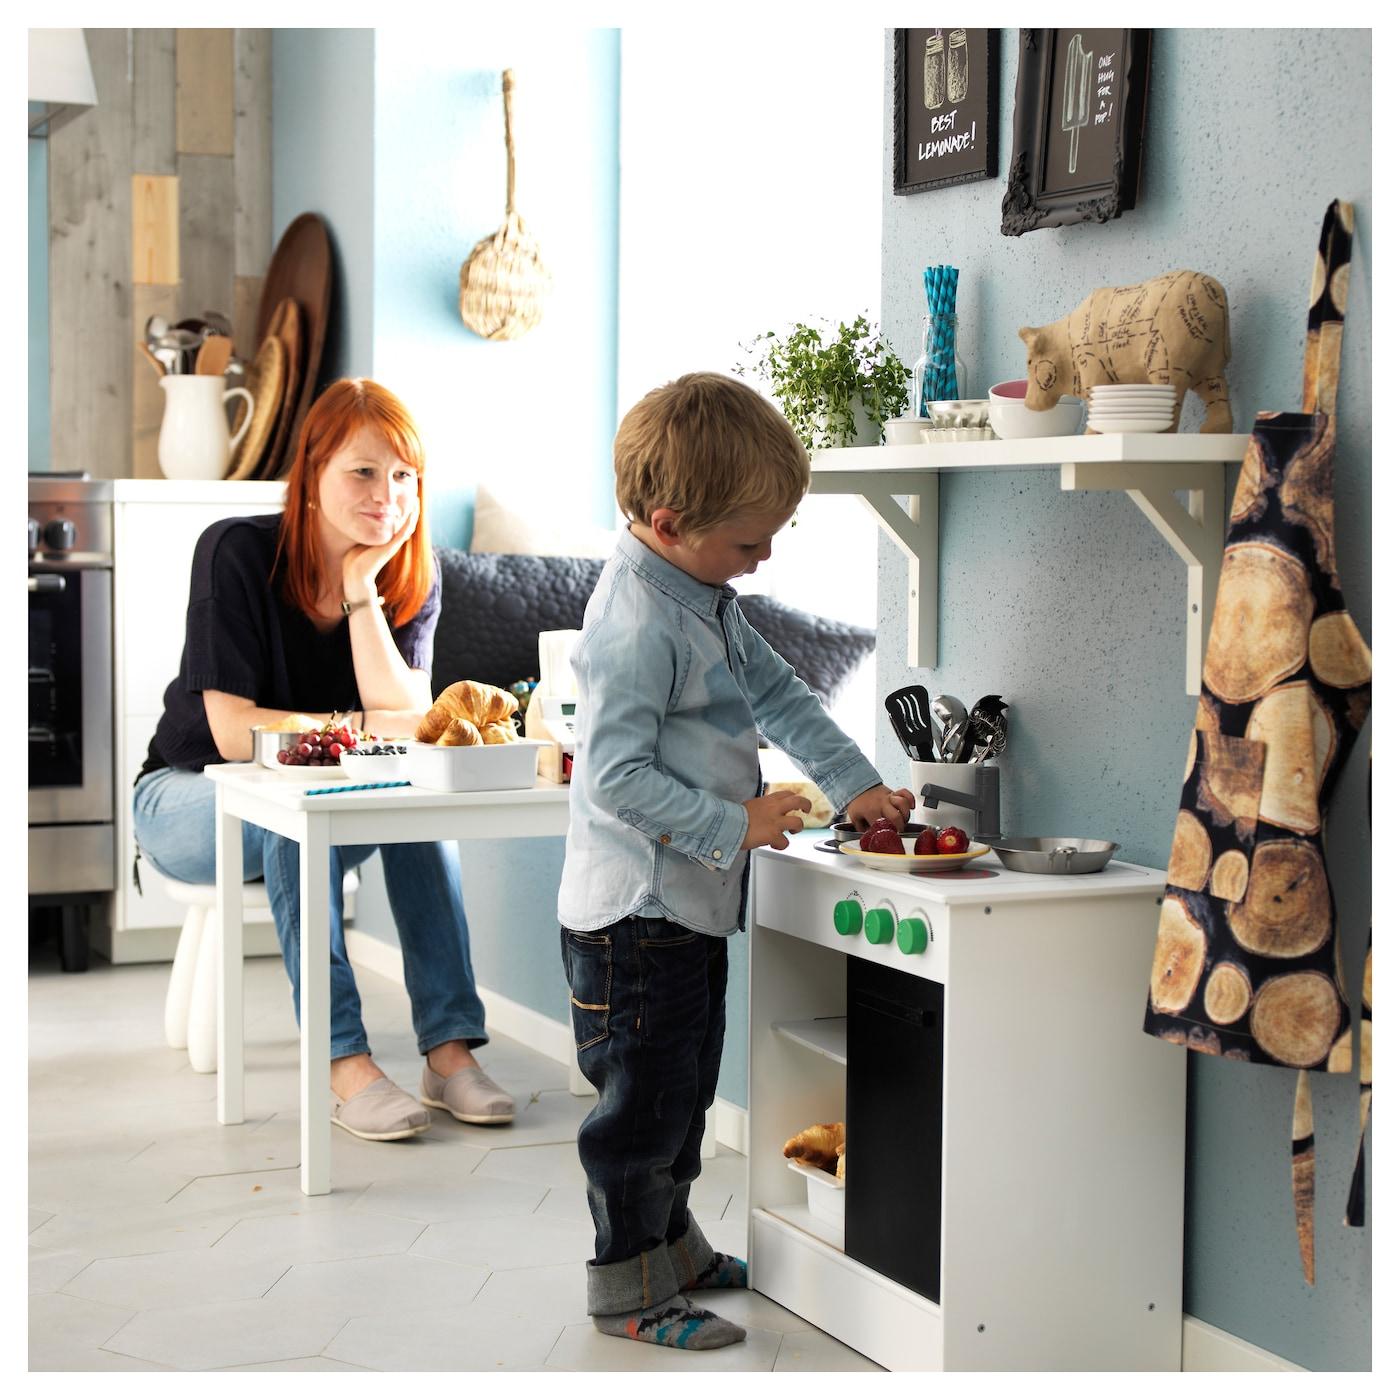 nybakad play kitchen white 49x30x50 cm - ikea